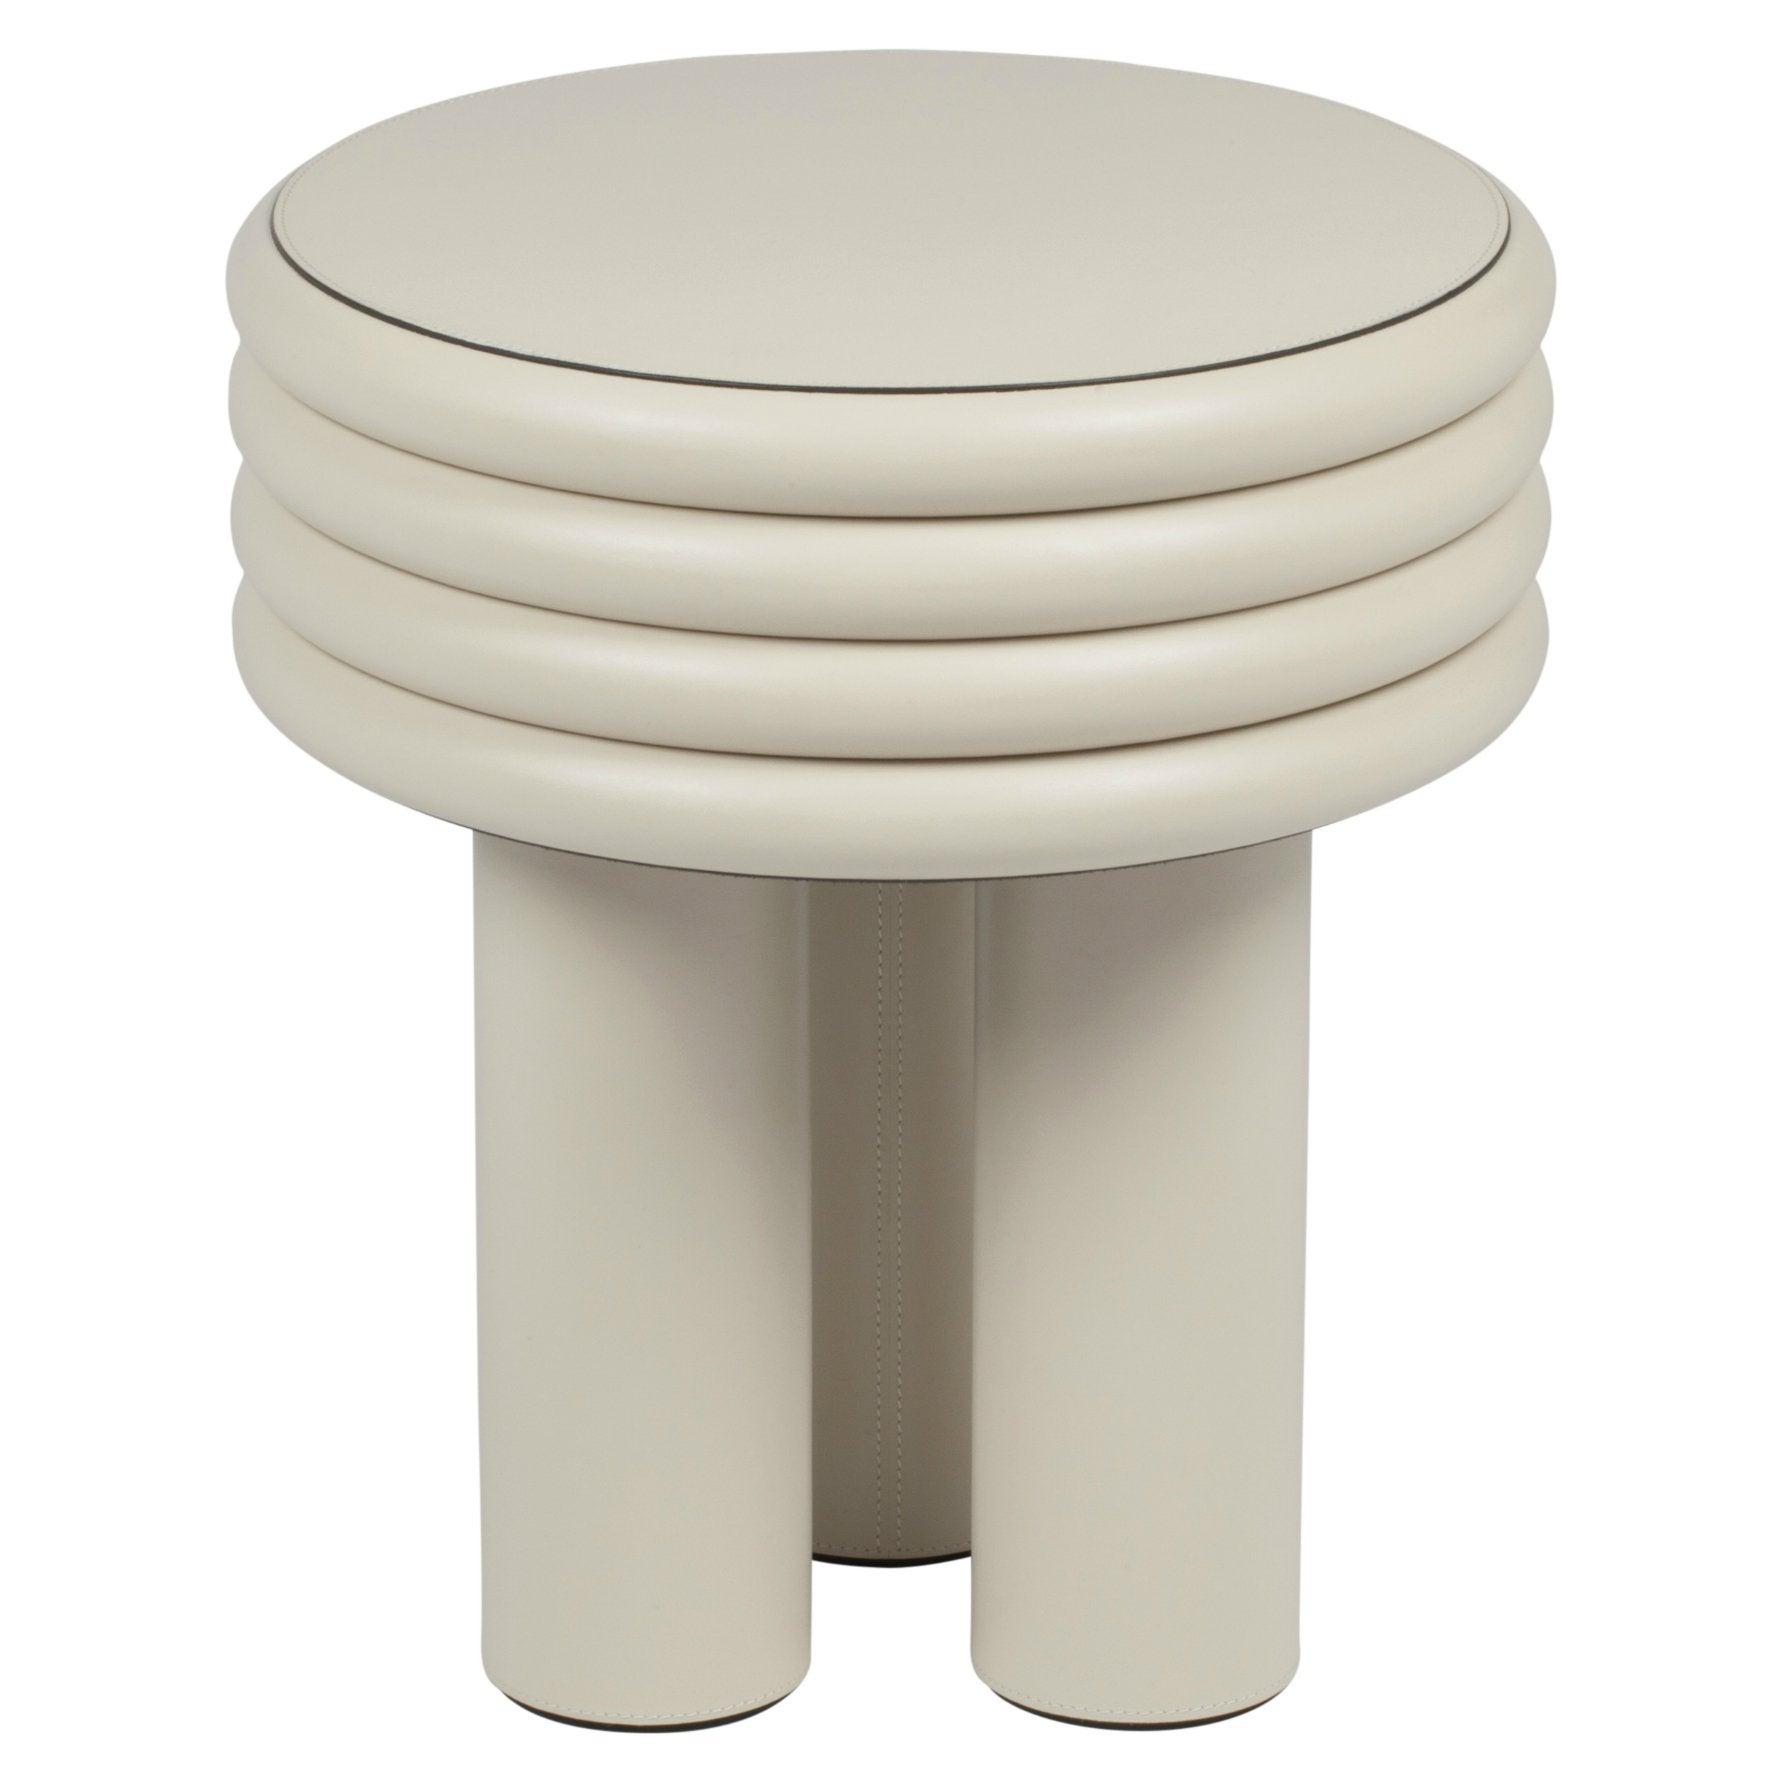 Miraculous Scala Leather Coffee Table Small High Ivory Nappa Inzonedesignstudio Interior Chair Design Inzonedesignstudiocom